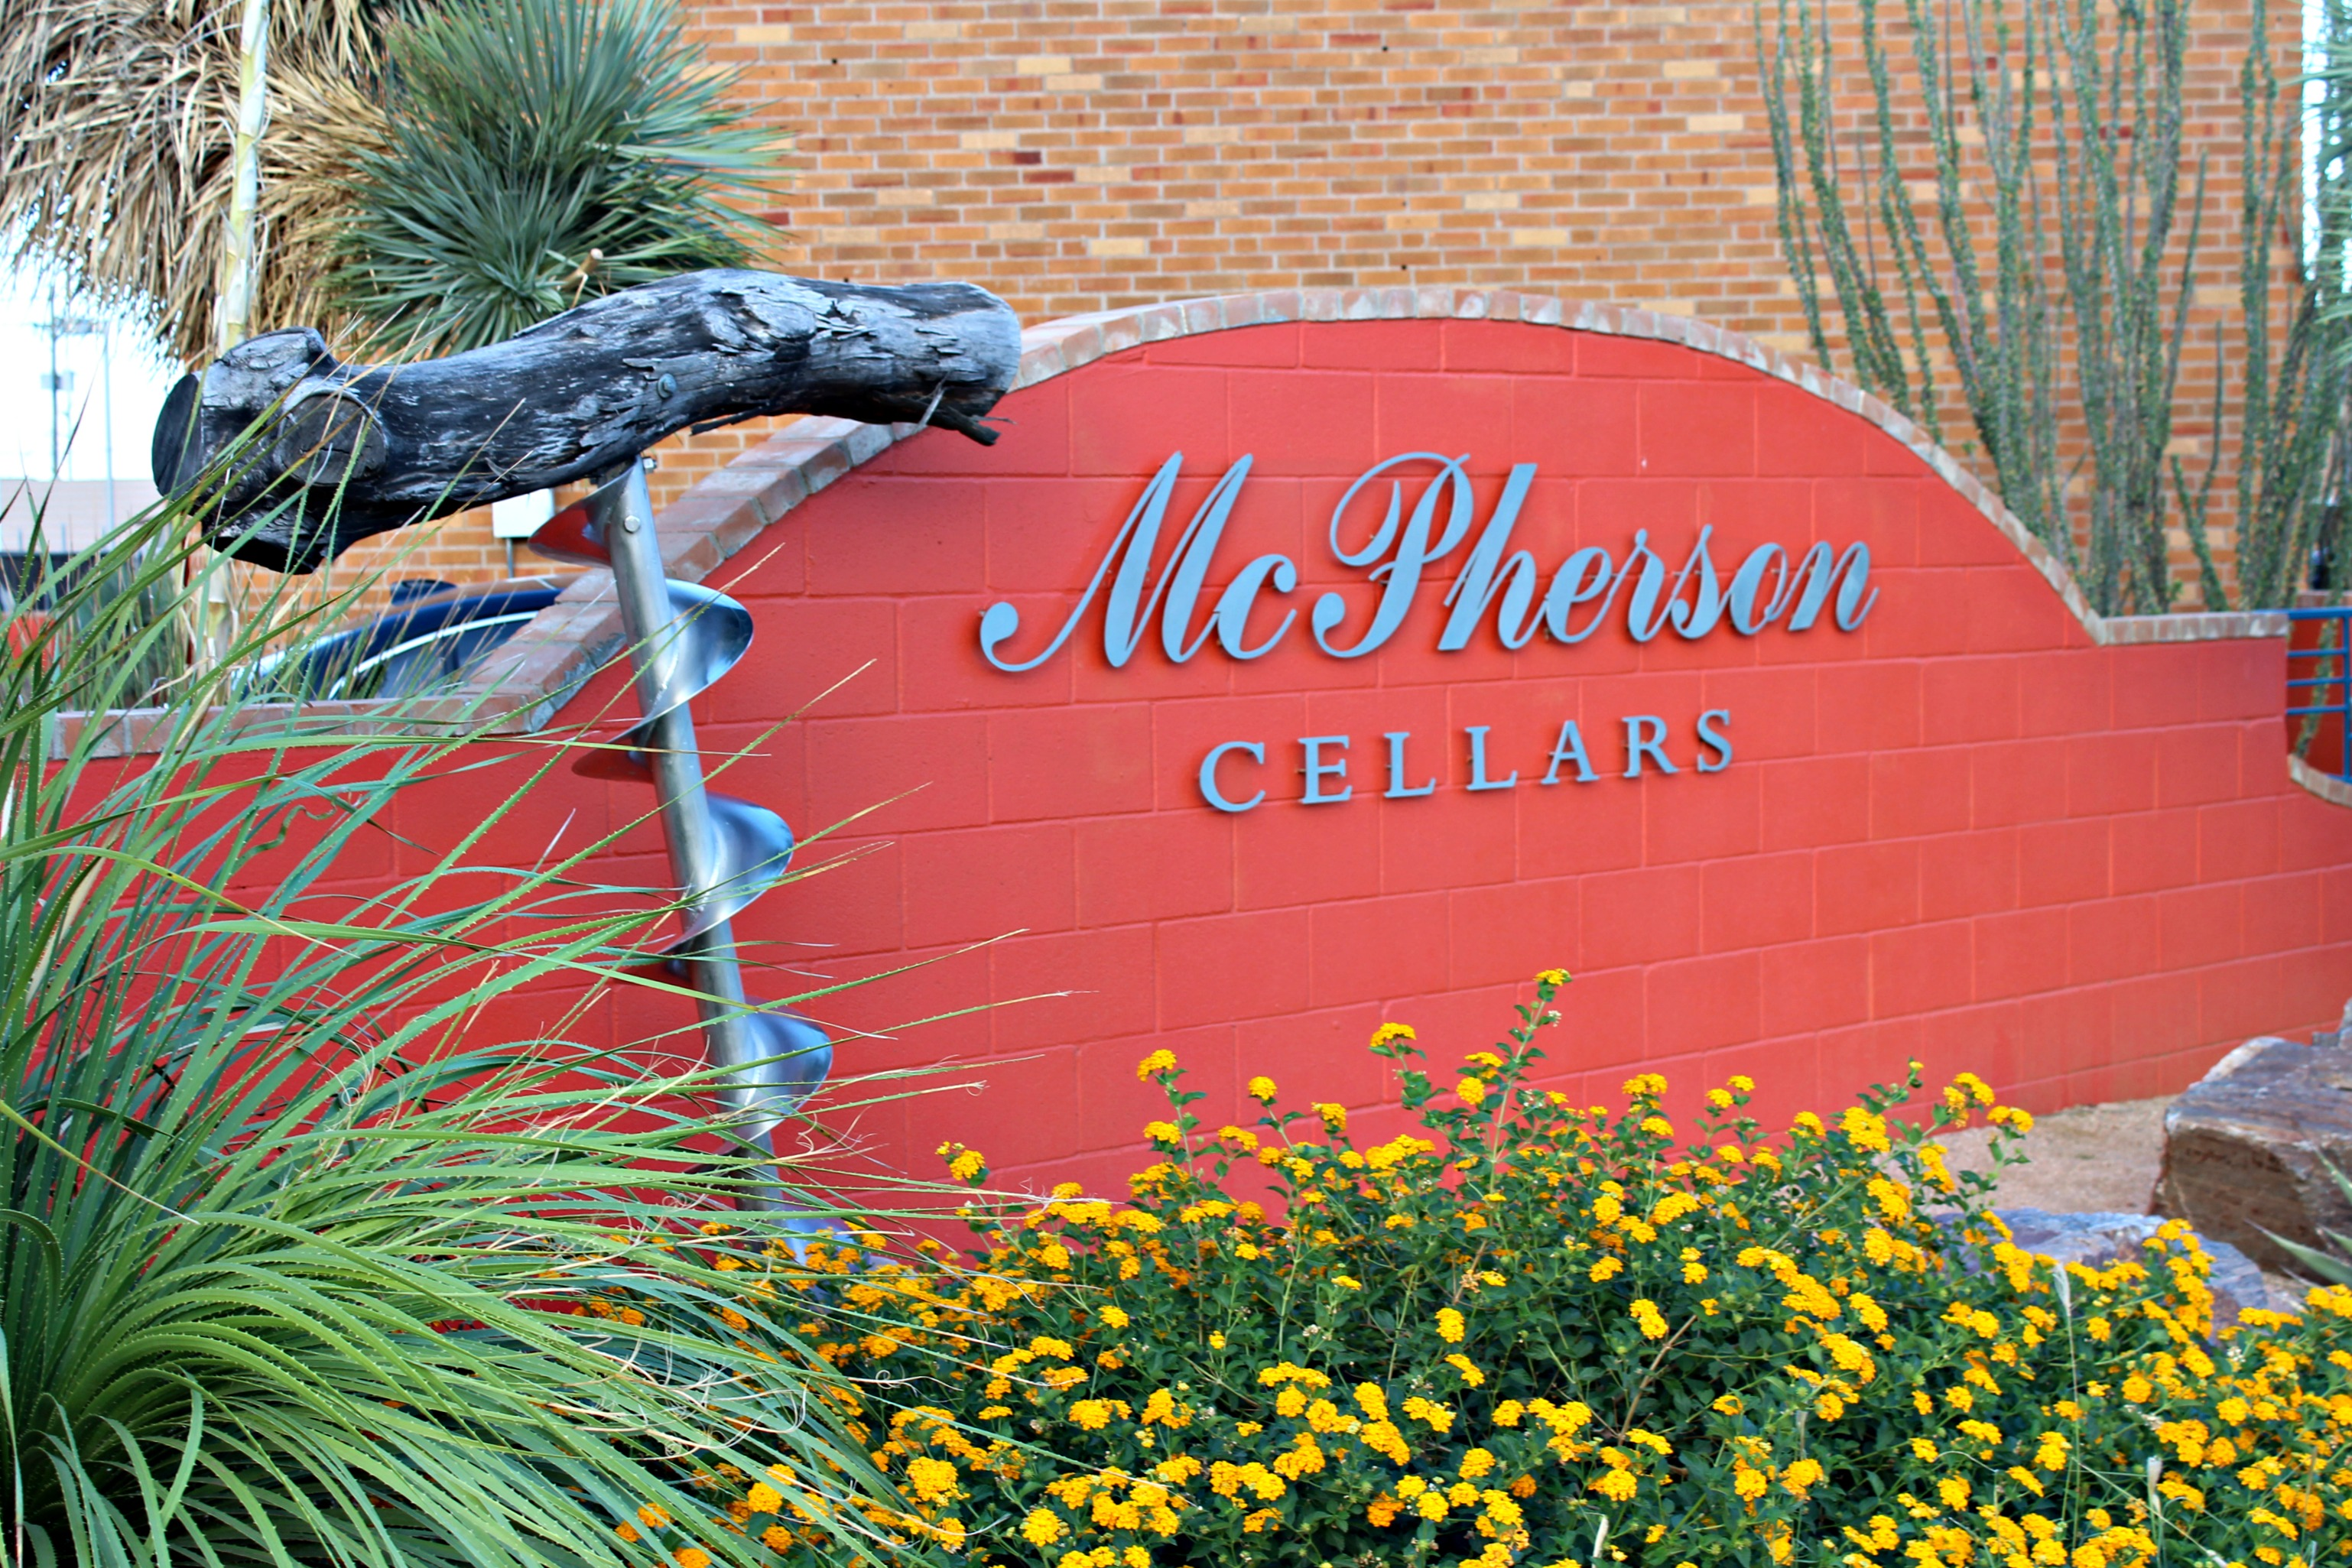 Tx Peanuts Tour McPherson Cellars